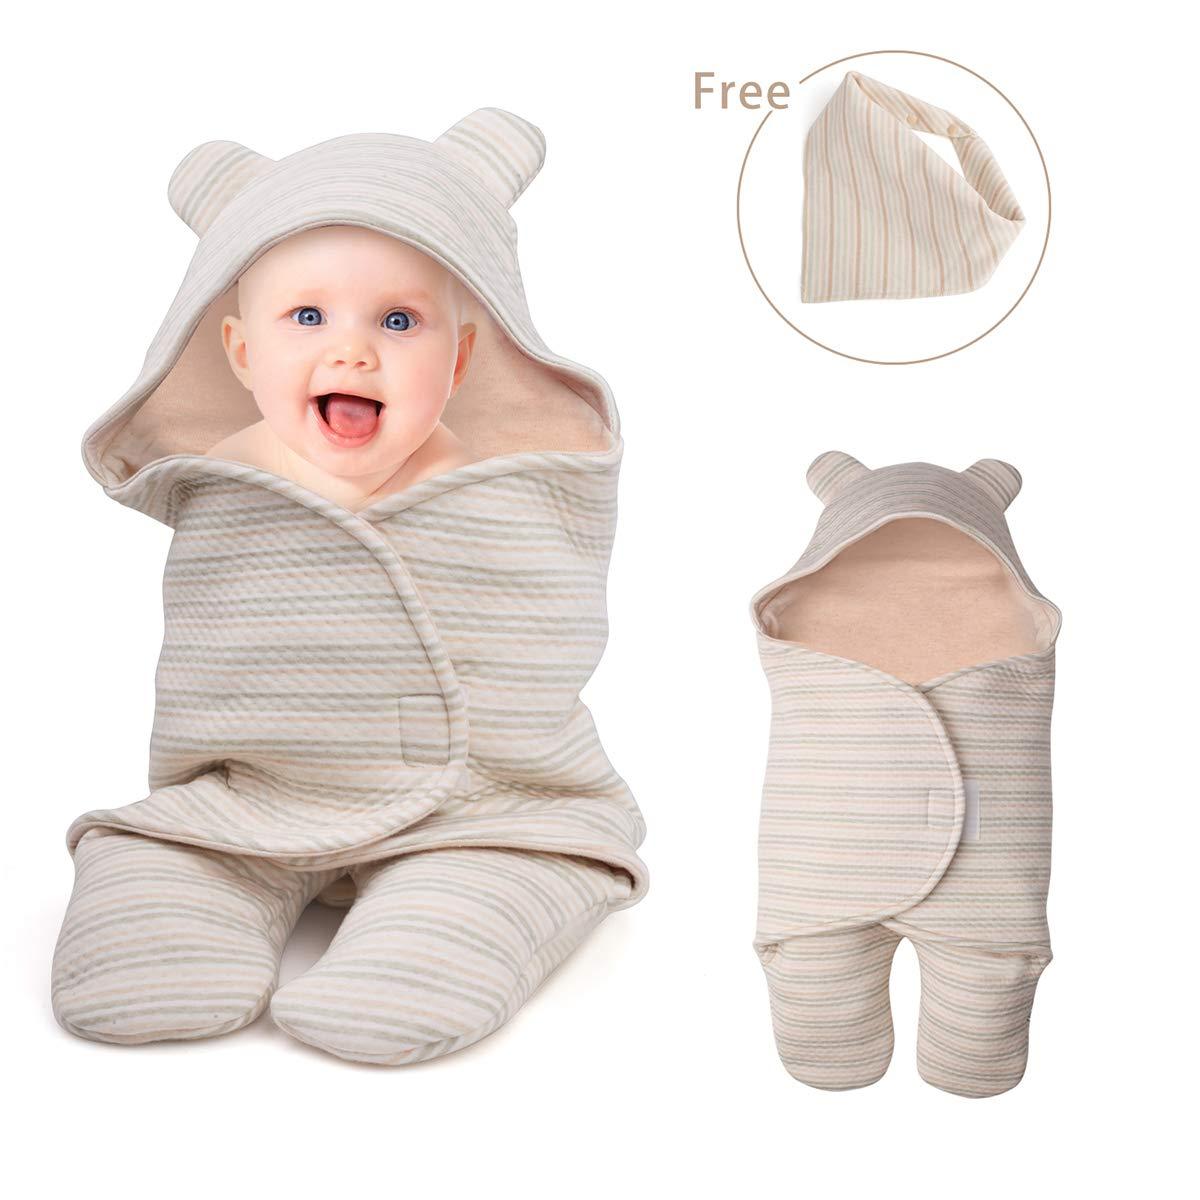 Newborn Baby Boys Girls Cute Receiving Blanket, Baby Kids Wrap Swaddle Blanket Sleeping Bag Sleep Sack Unisex Stroller Wrap for Baby DTC